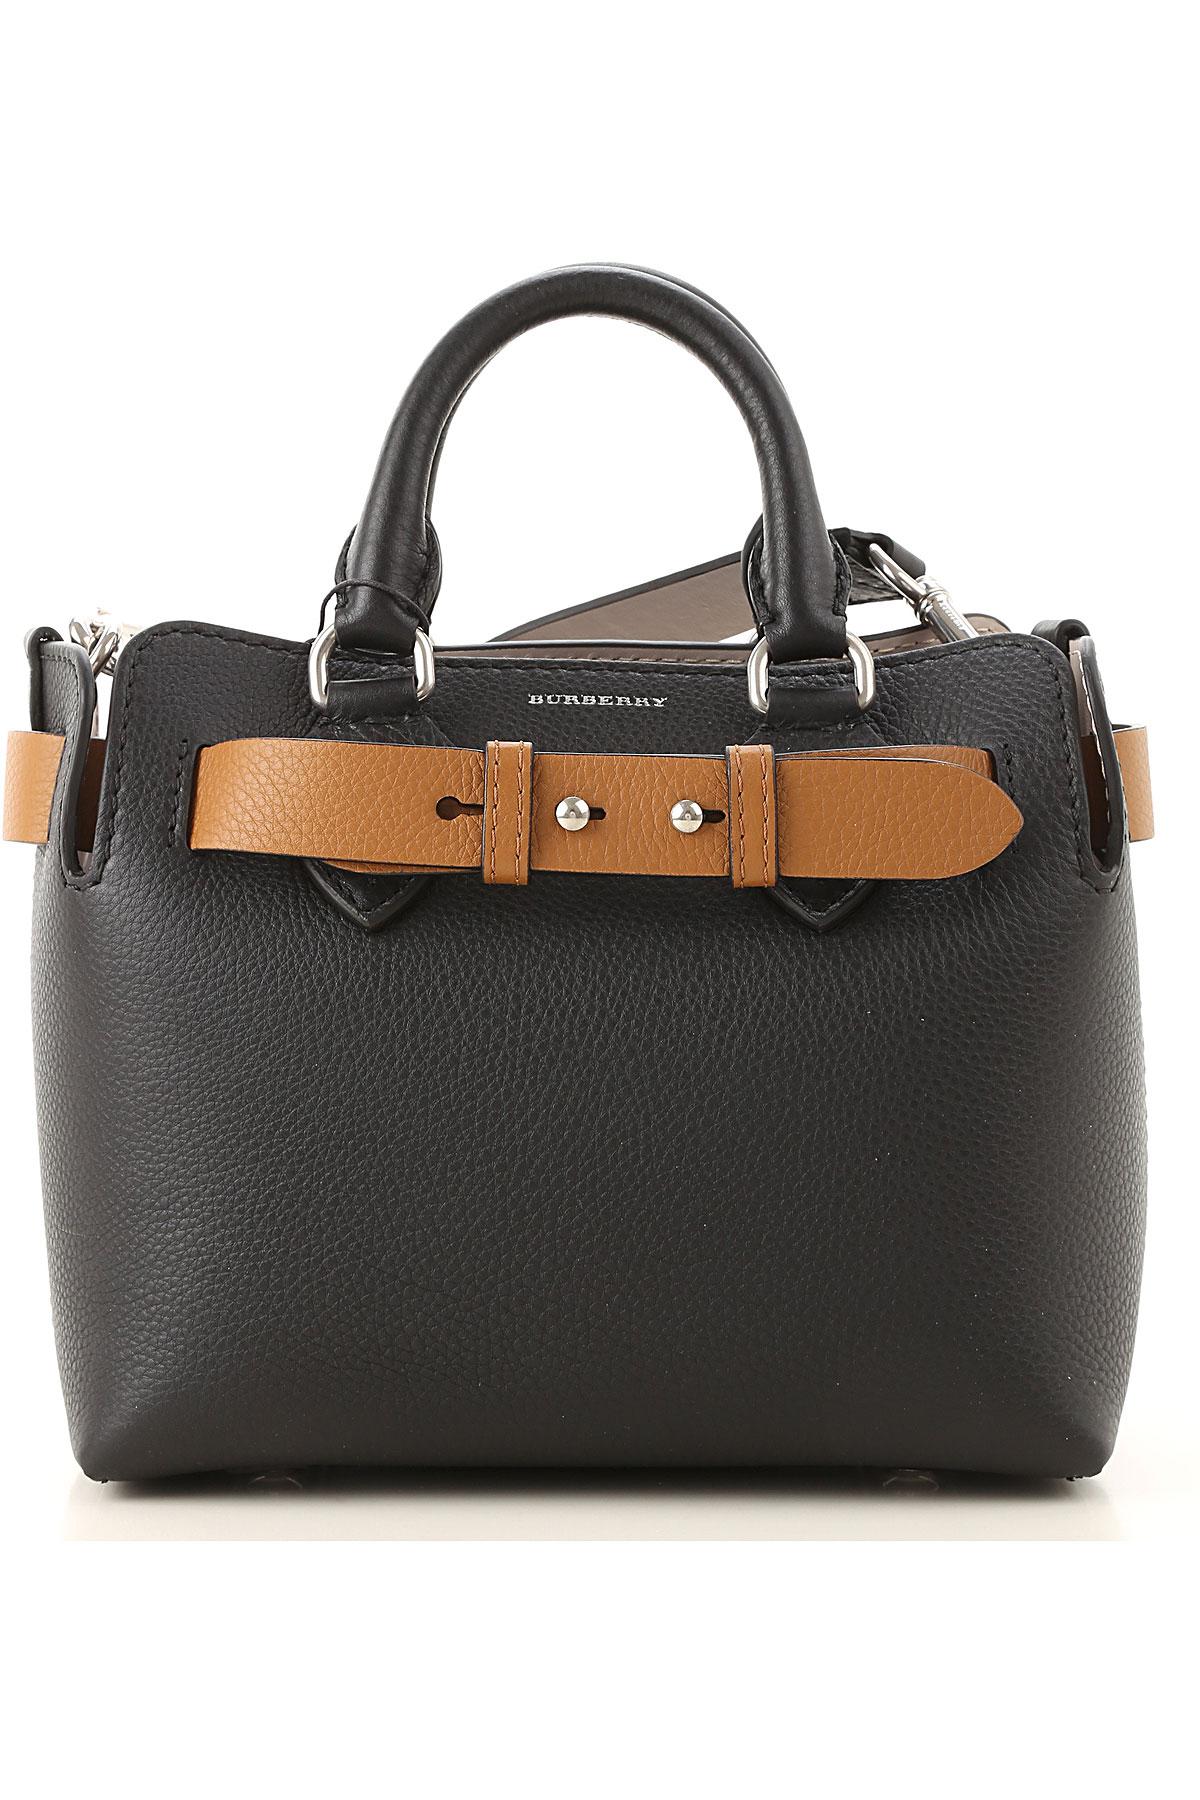 e8b3a86c Handbags Burberry, Style code: 8006678-00100-babybeltbag